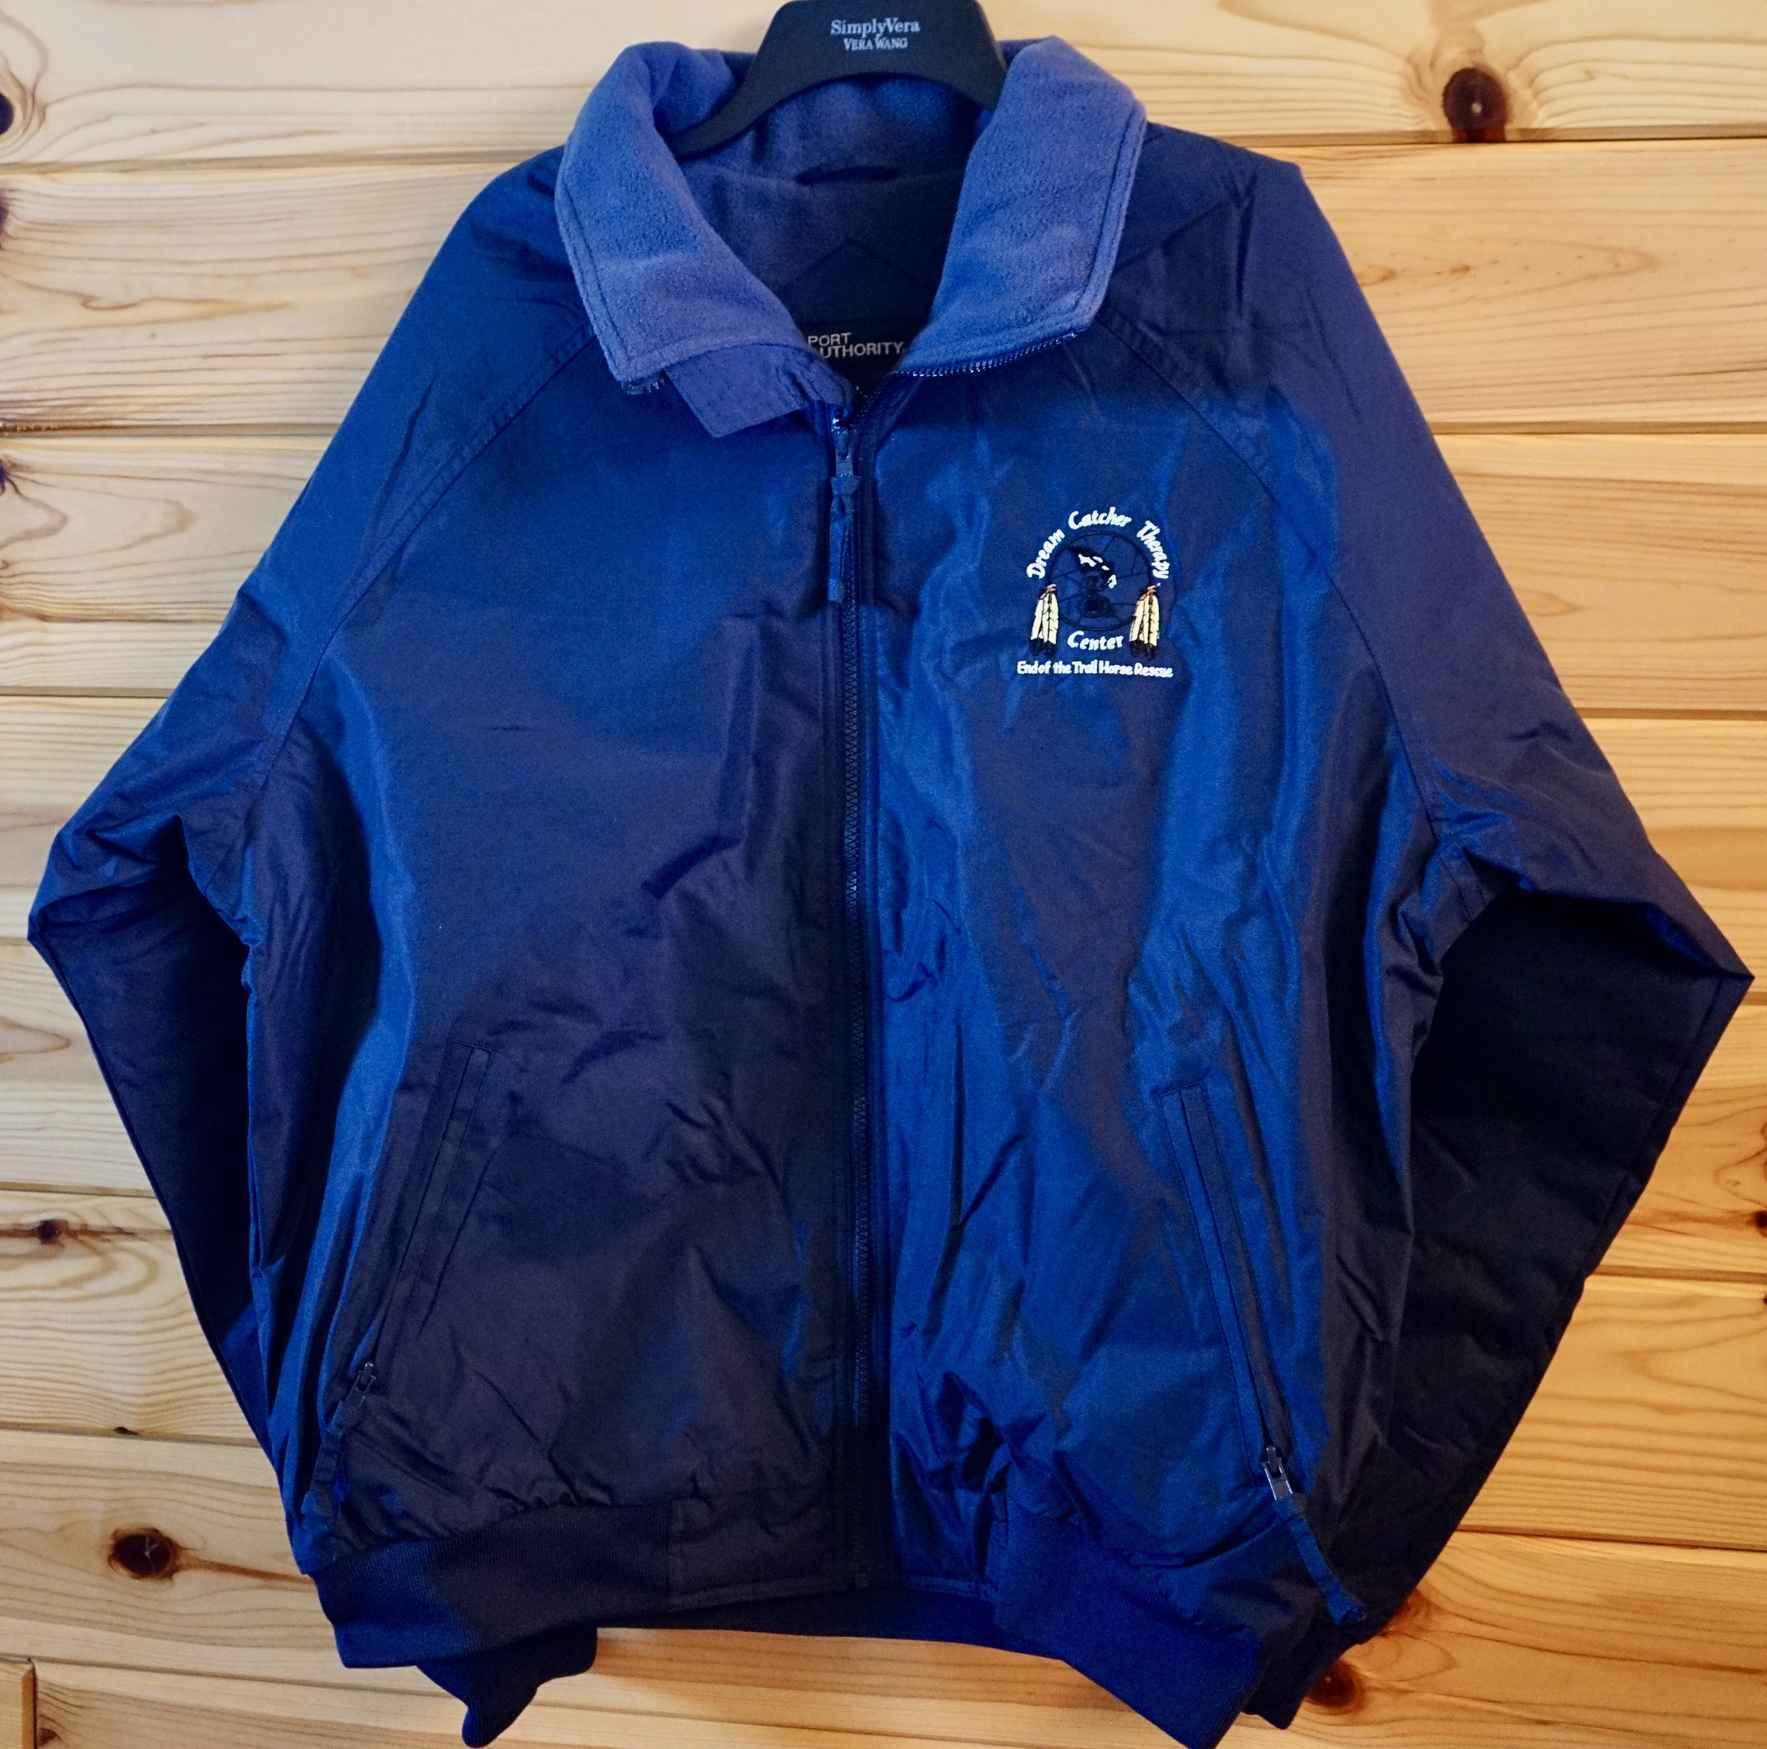 Three Season Jackets, Sweater Jackets, Lightweight Jackets, Hats image